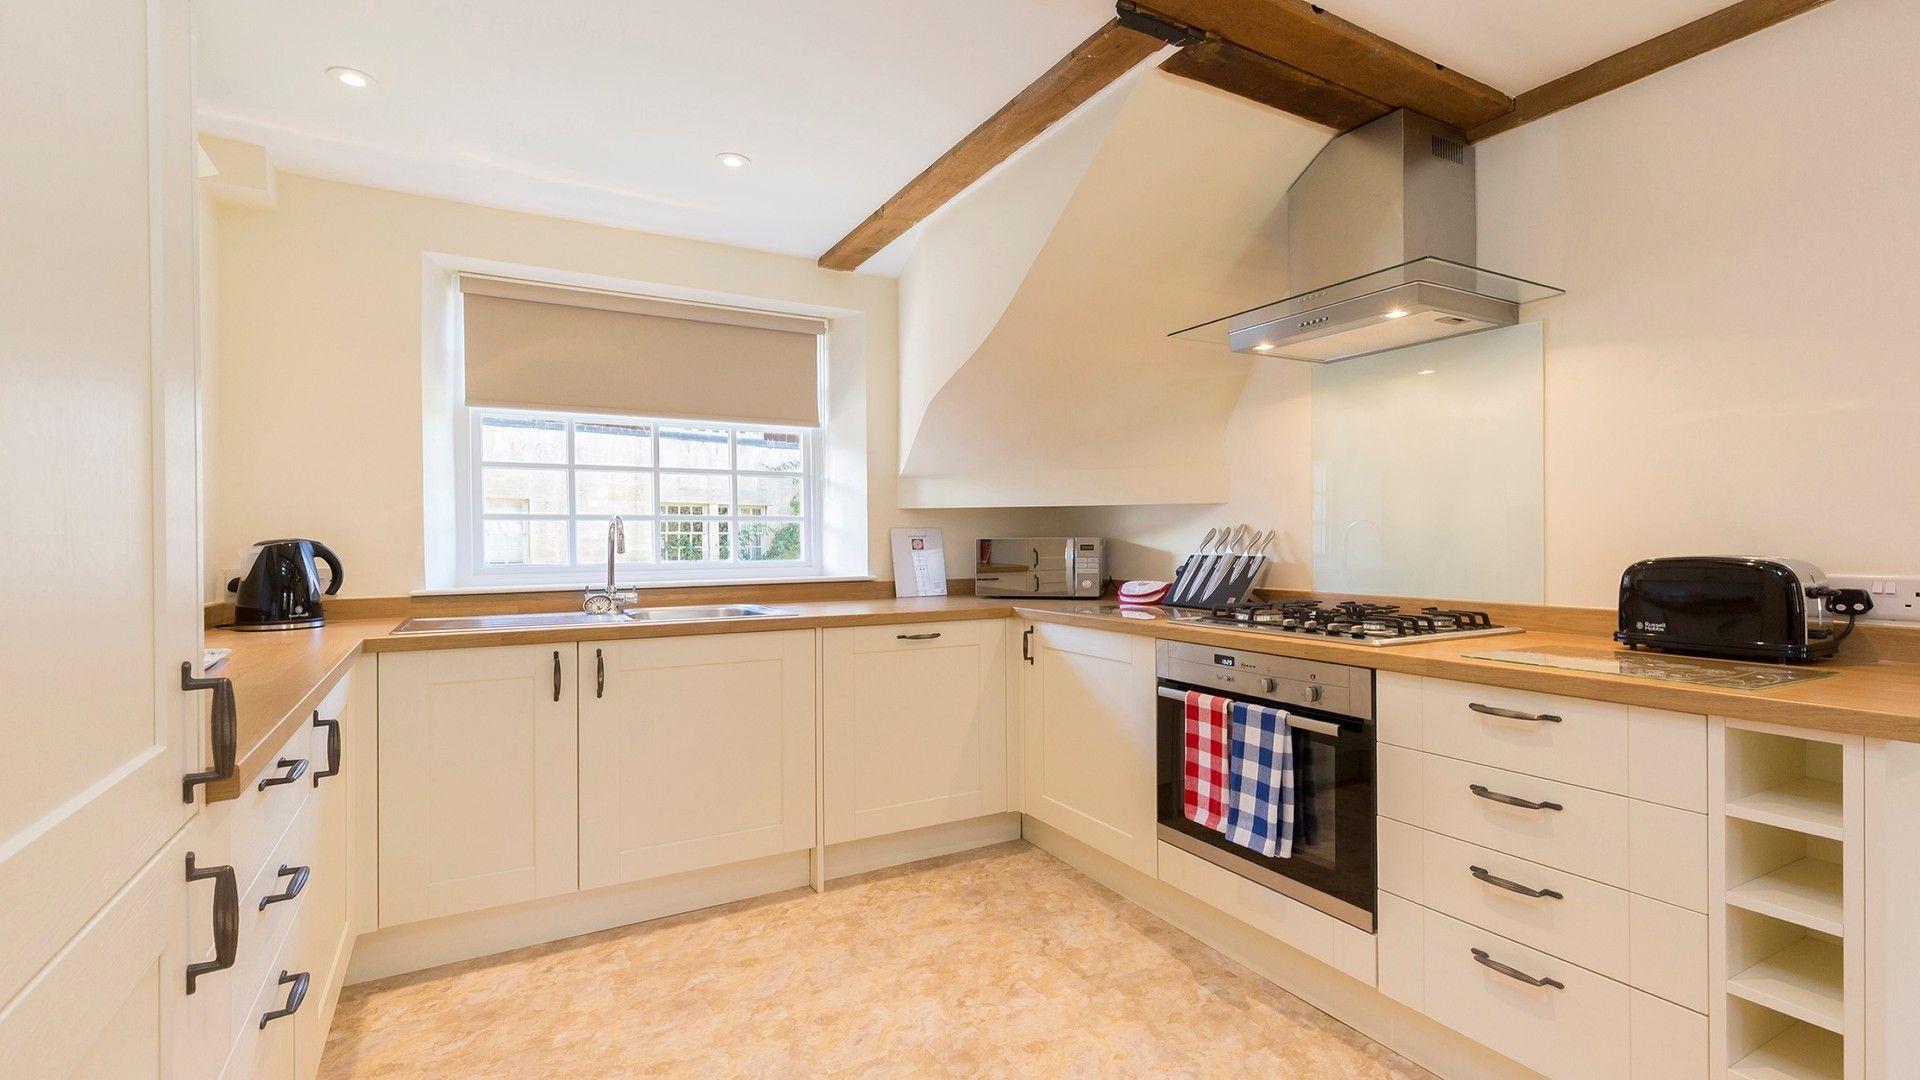 Kitchen, George III, Bolthole Retreats